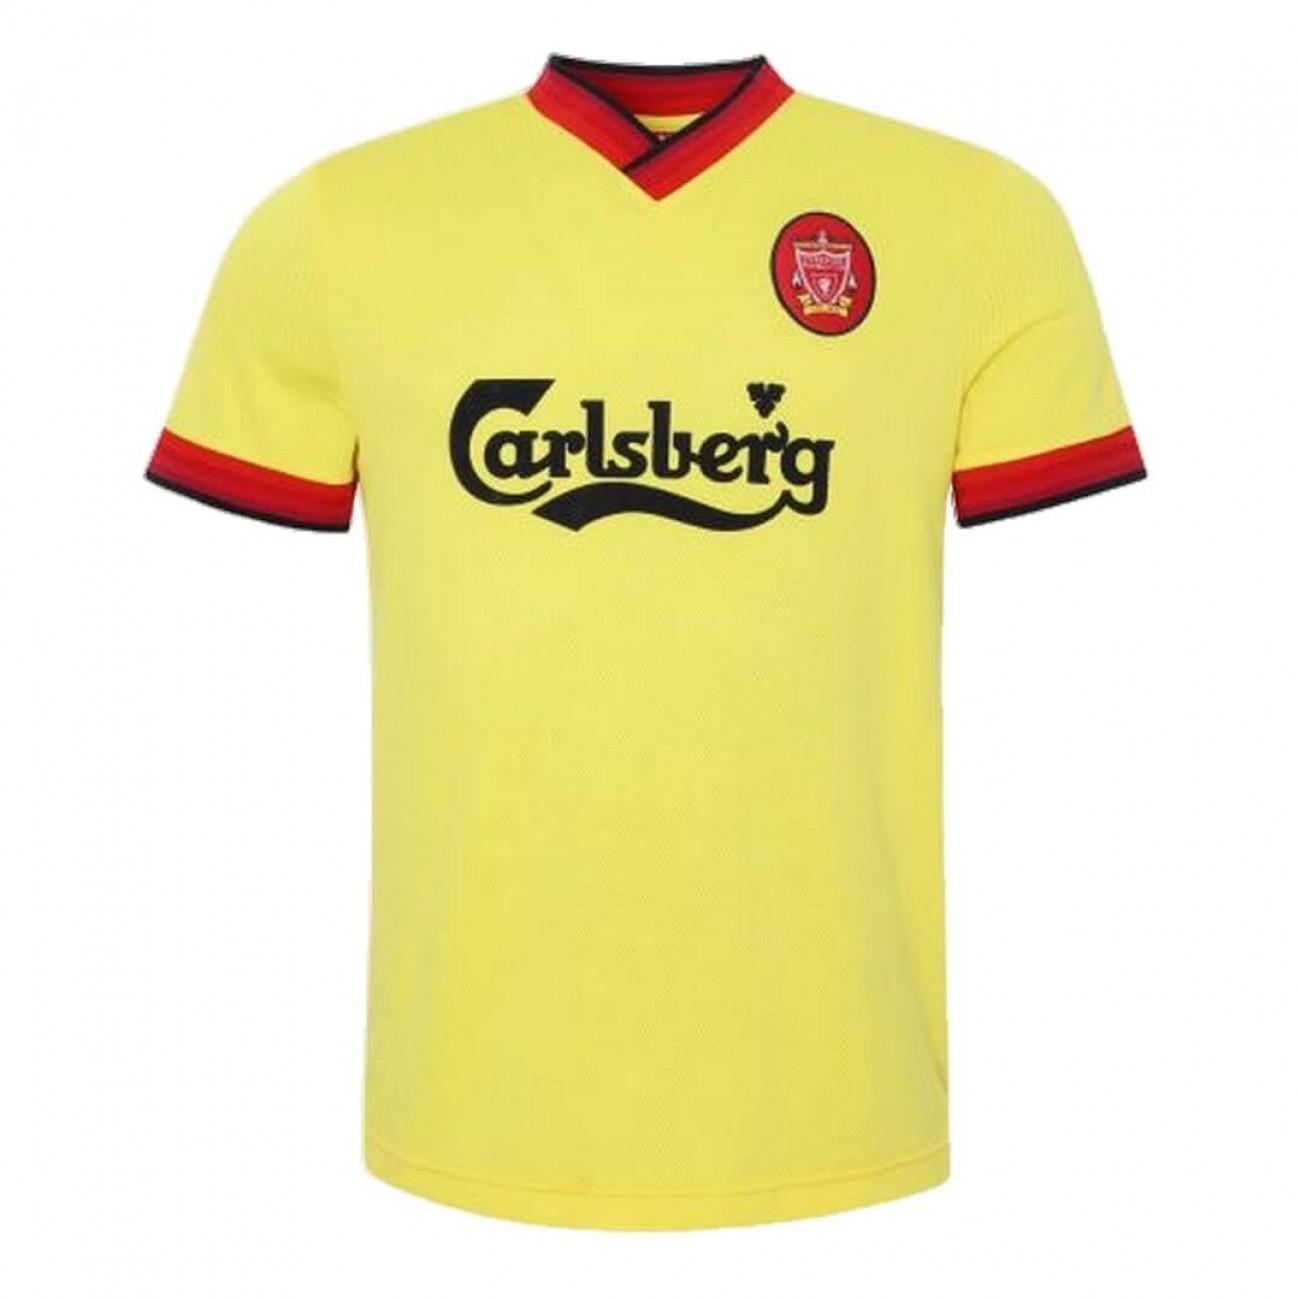 Liverpool FC 1997-98 Away football shirt